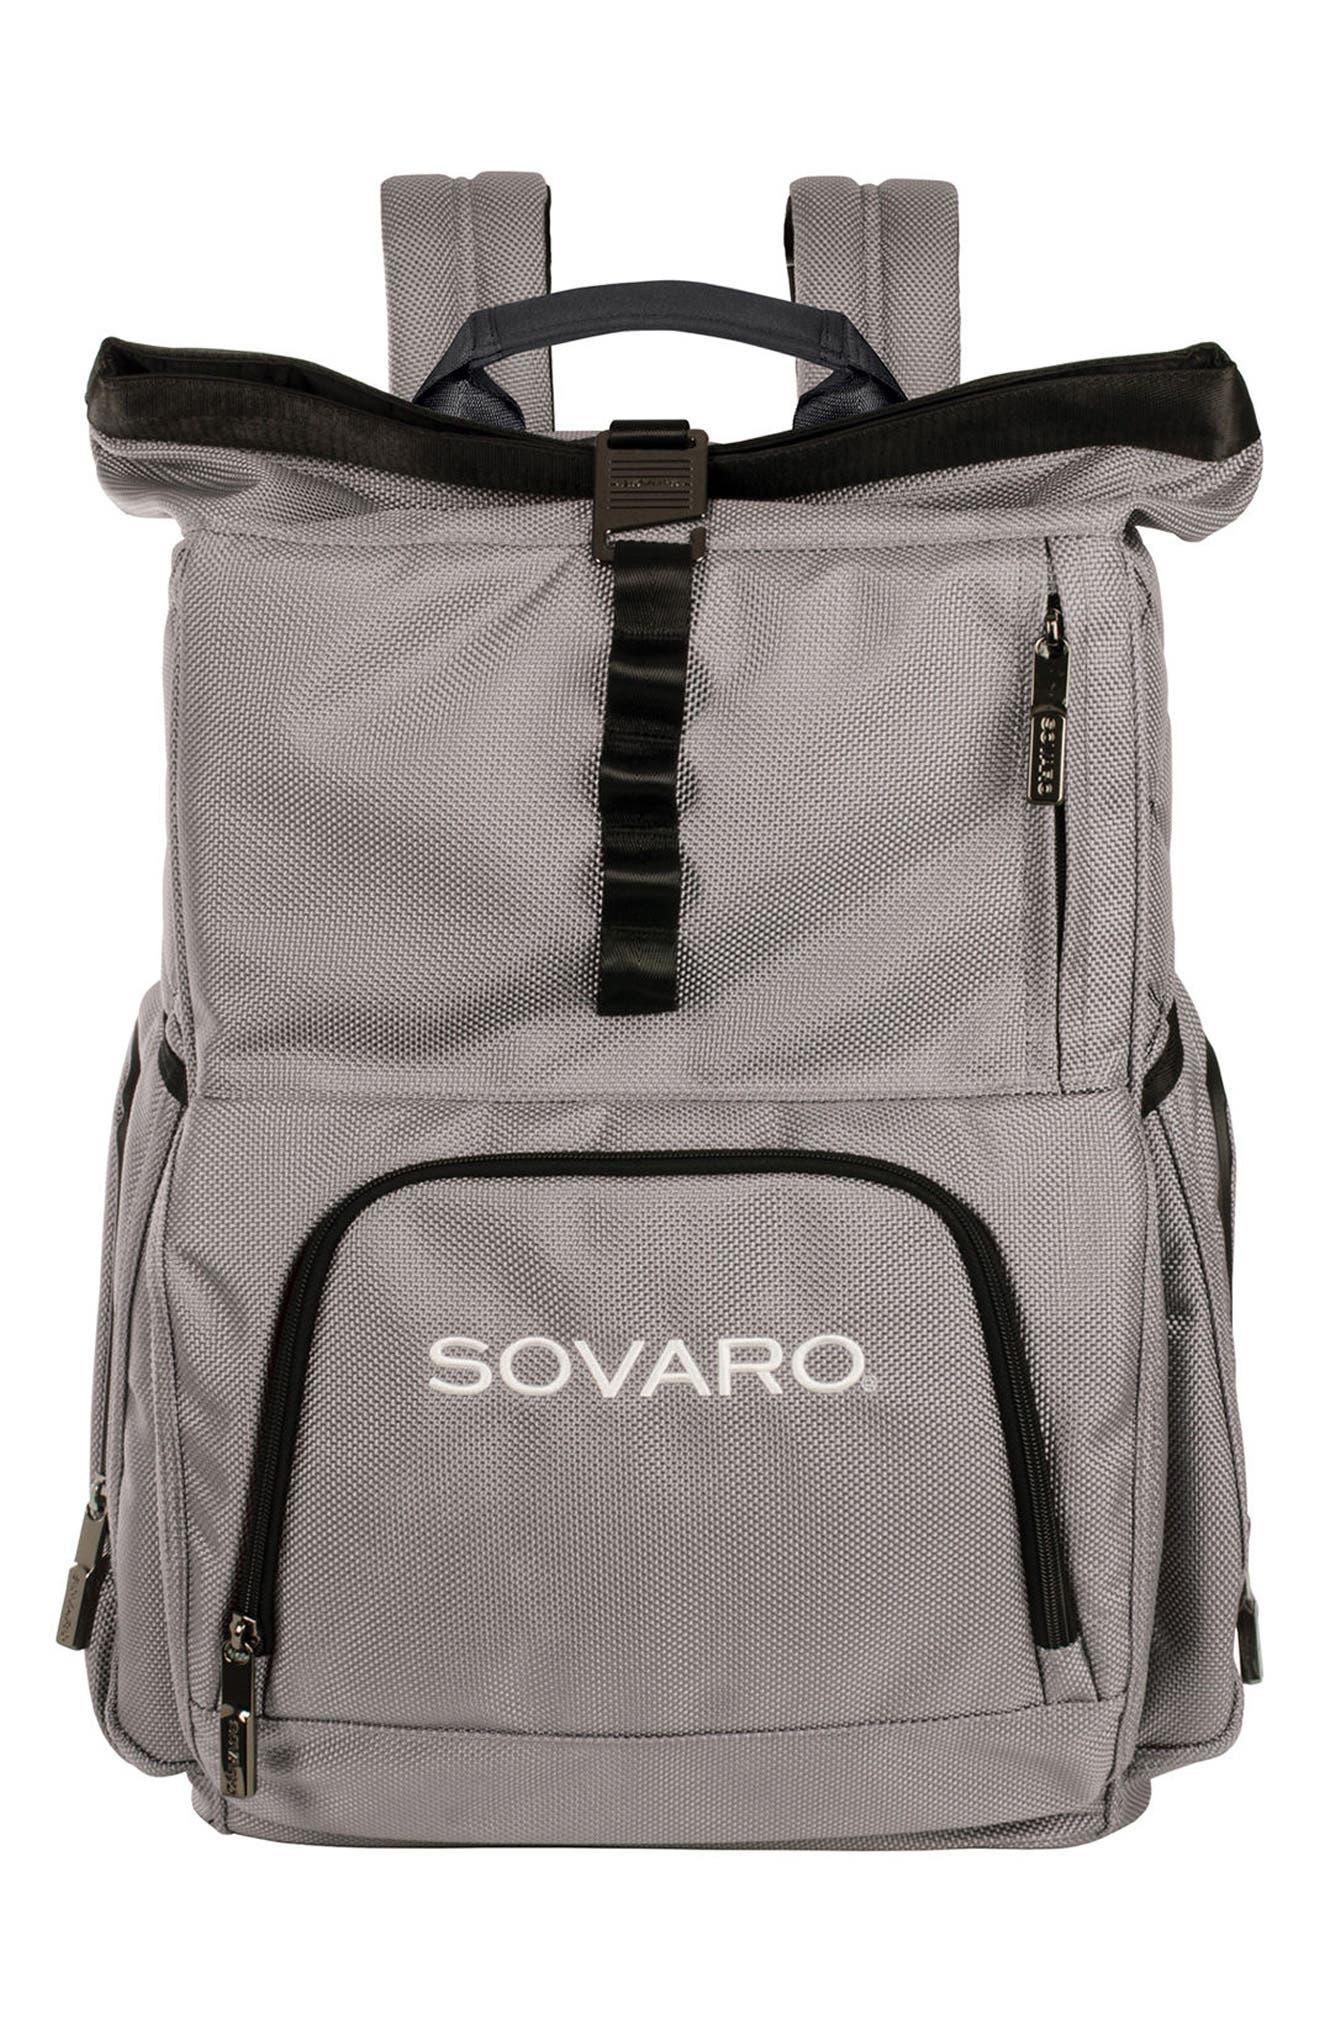 Backpack Cooler,                             Main thumbnail 1, color,                             Gray